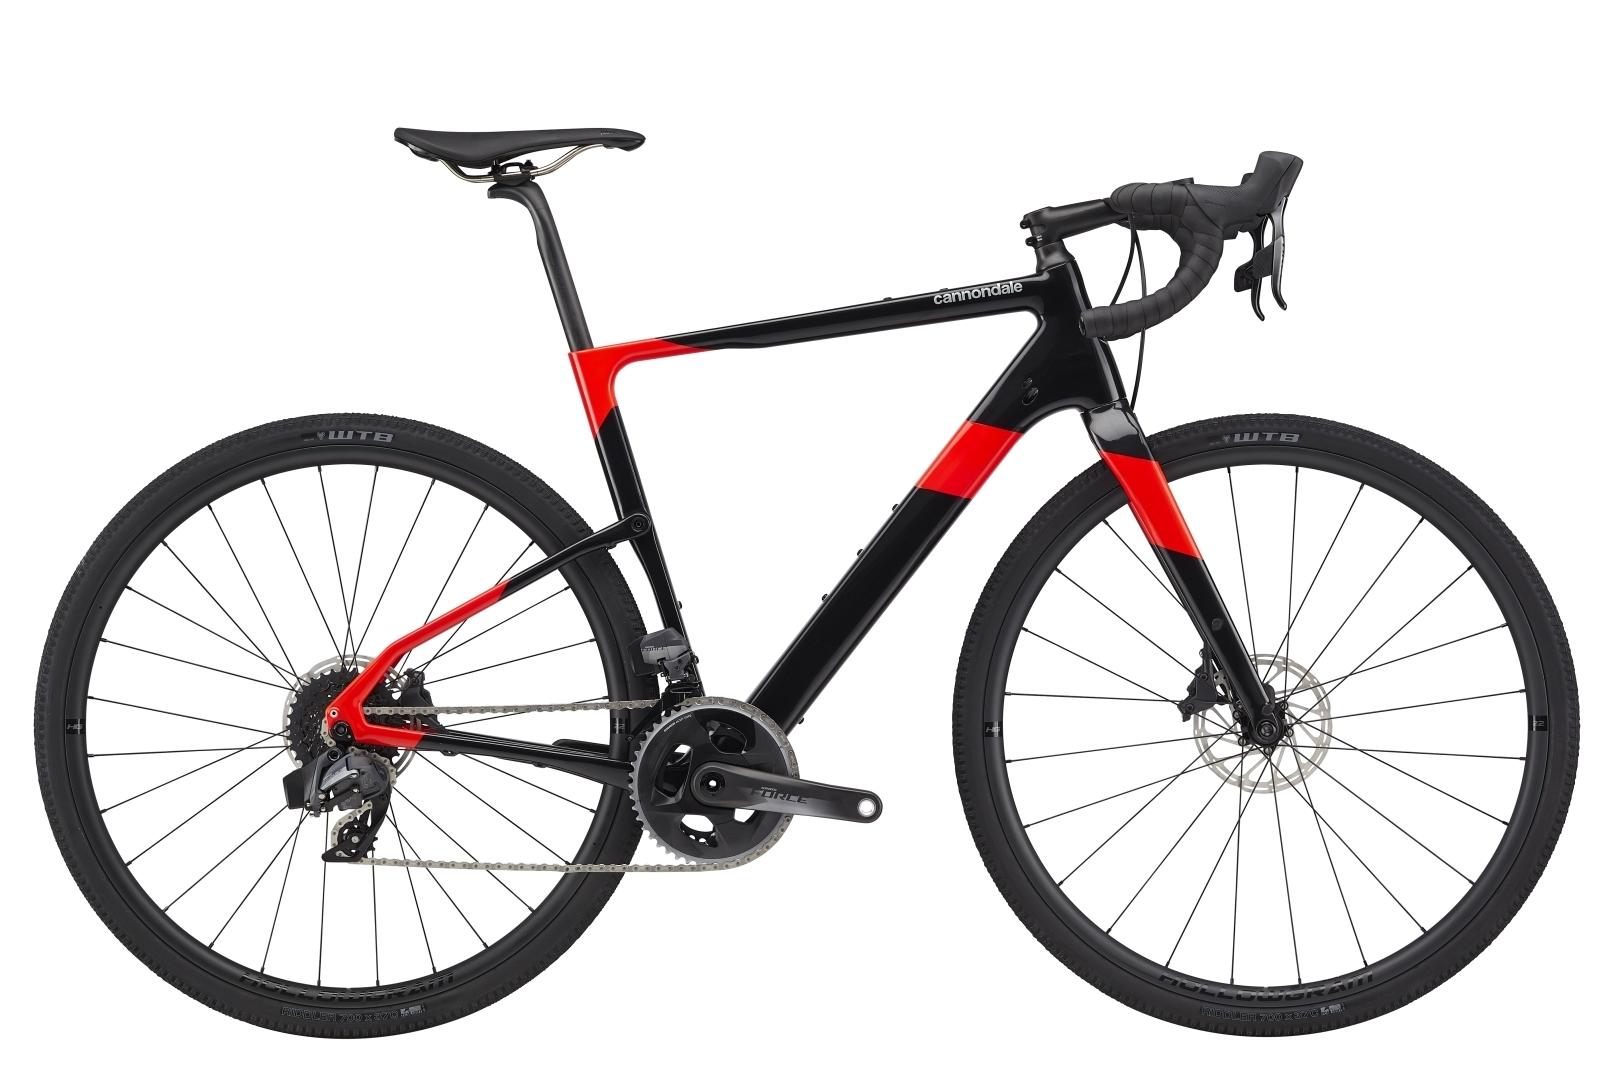 Cannondale Topstone Carbon Force eTAP gravel kerékpár - fekete - XL (2020)